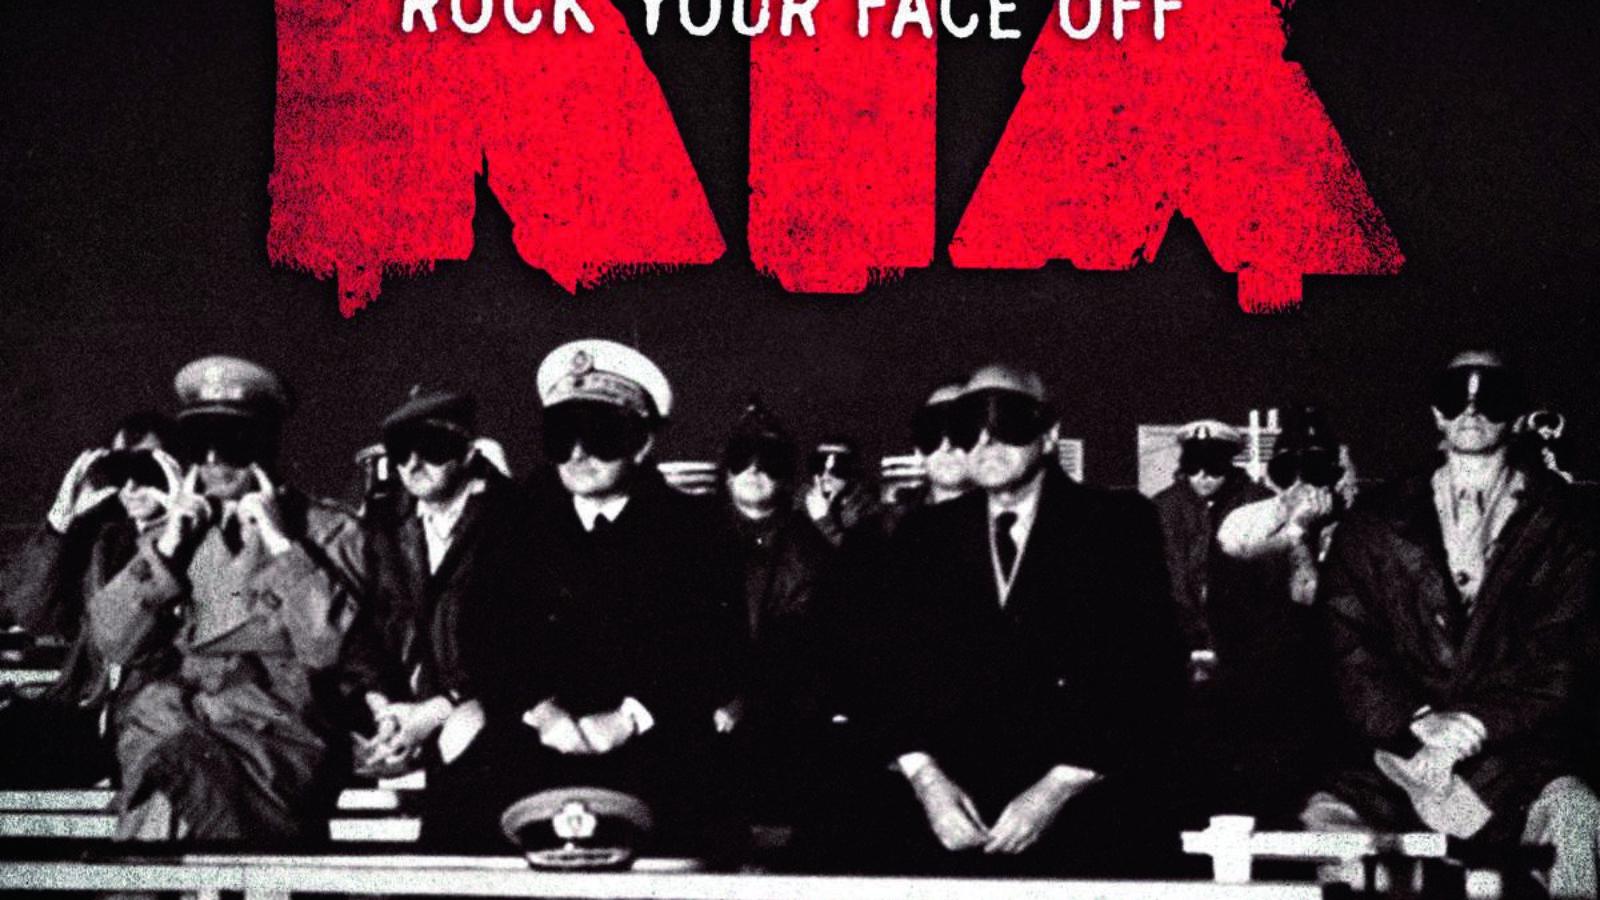 KIX – Rock Your Face Off